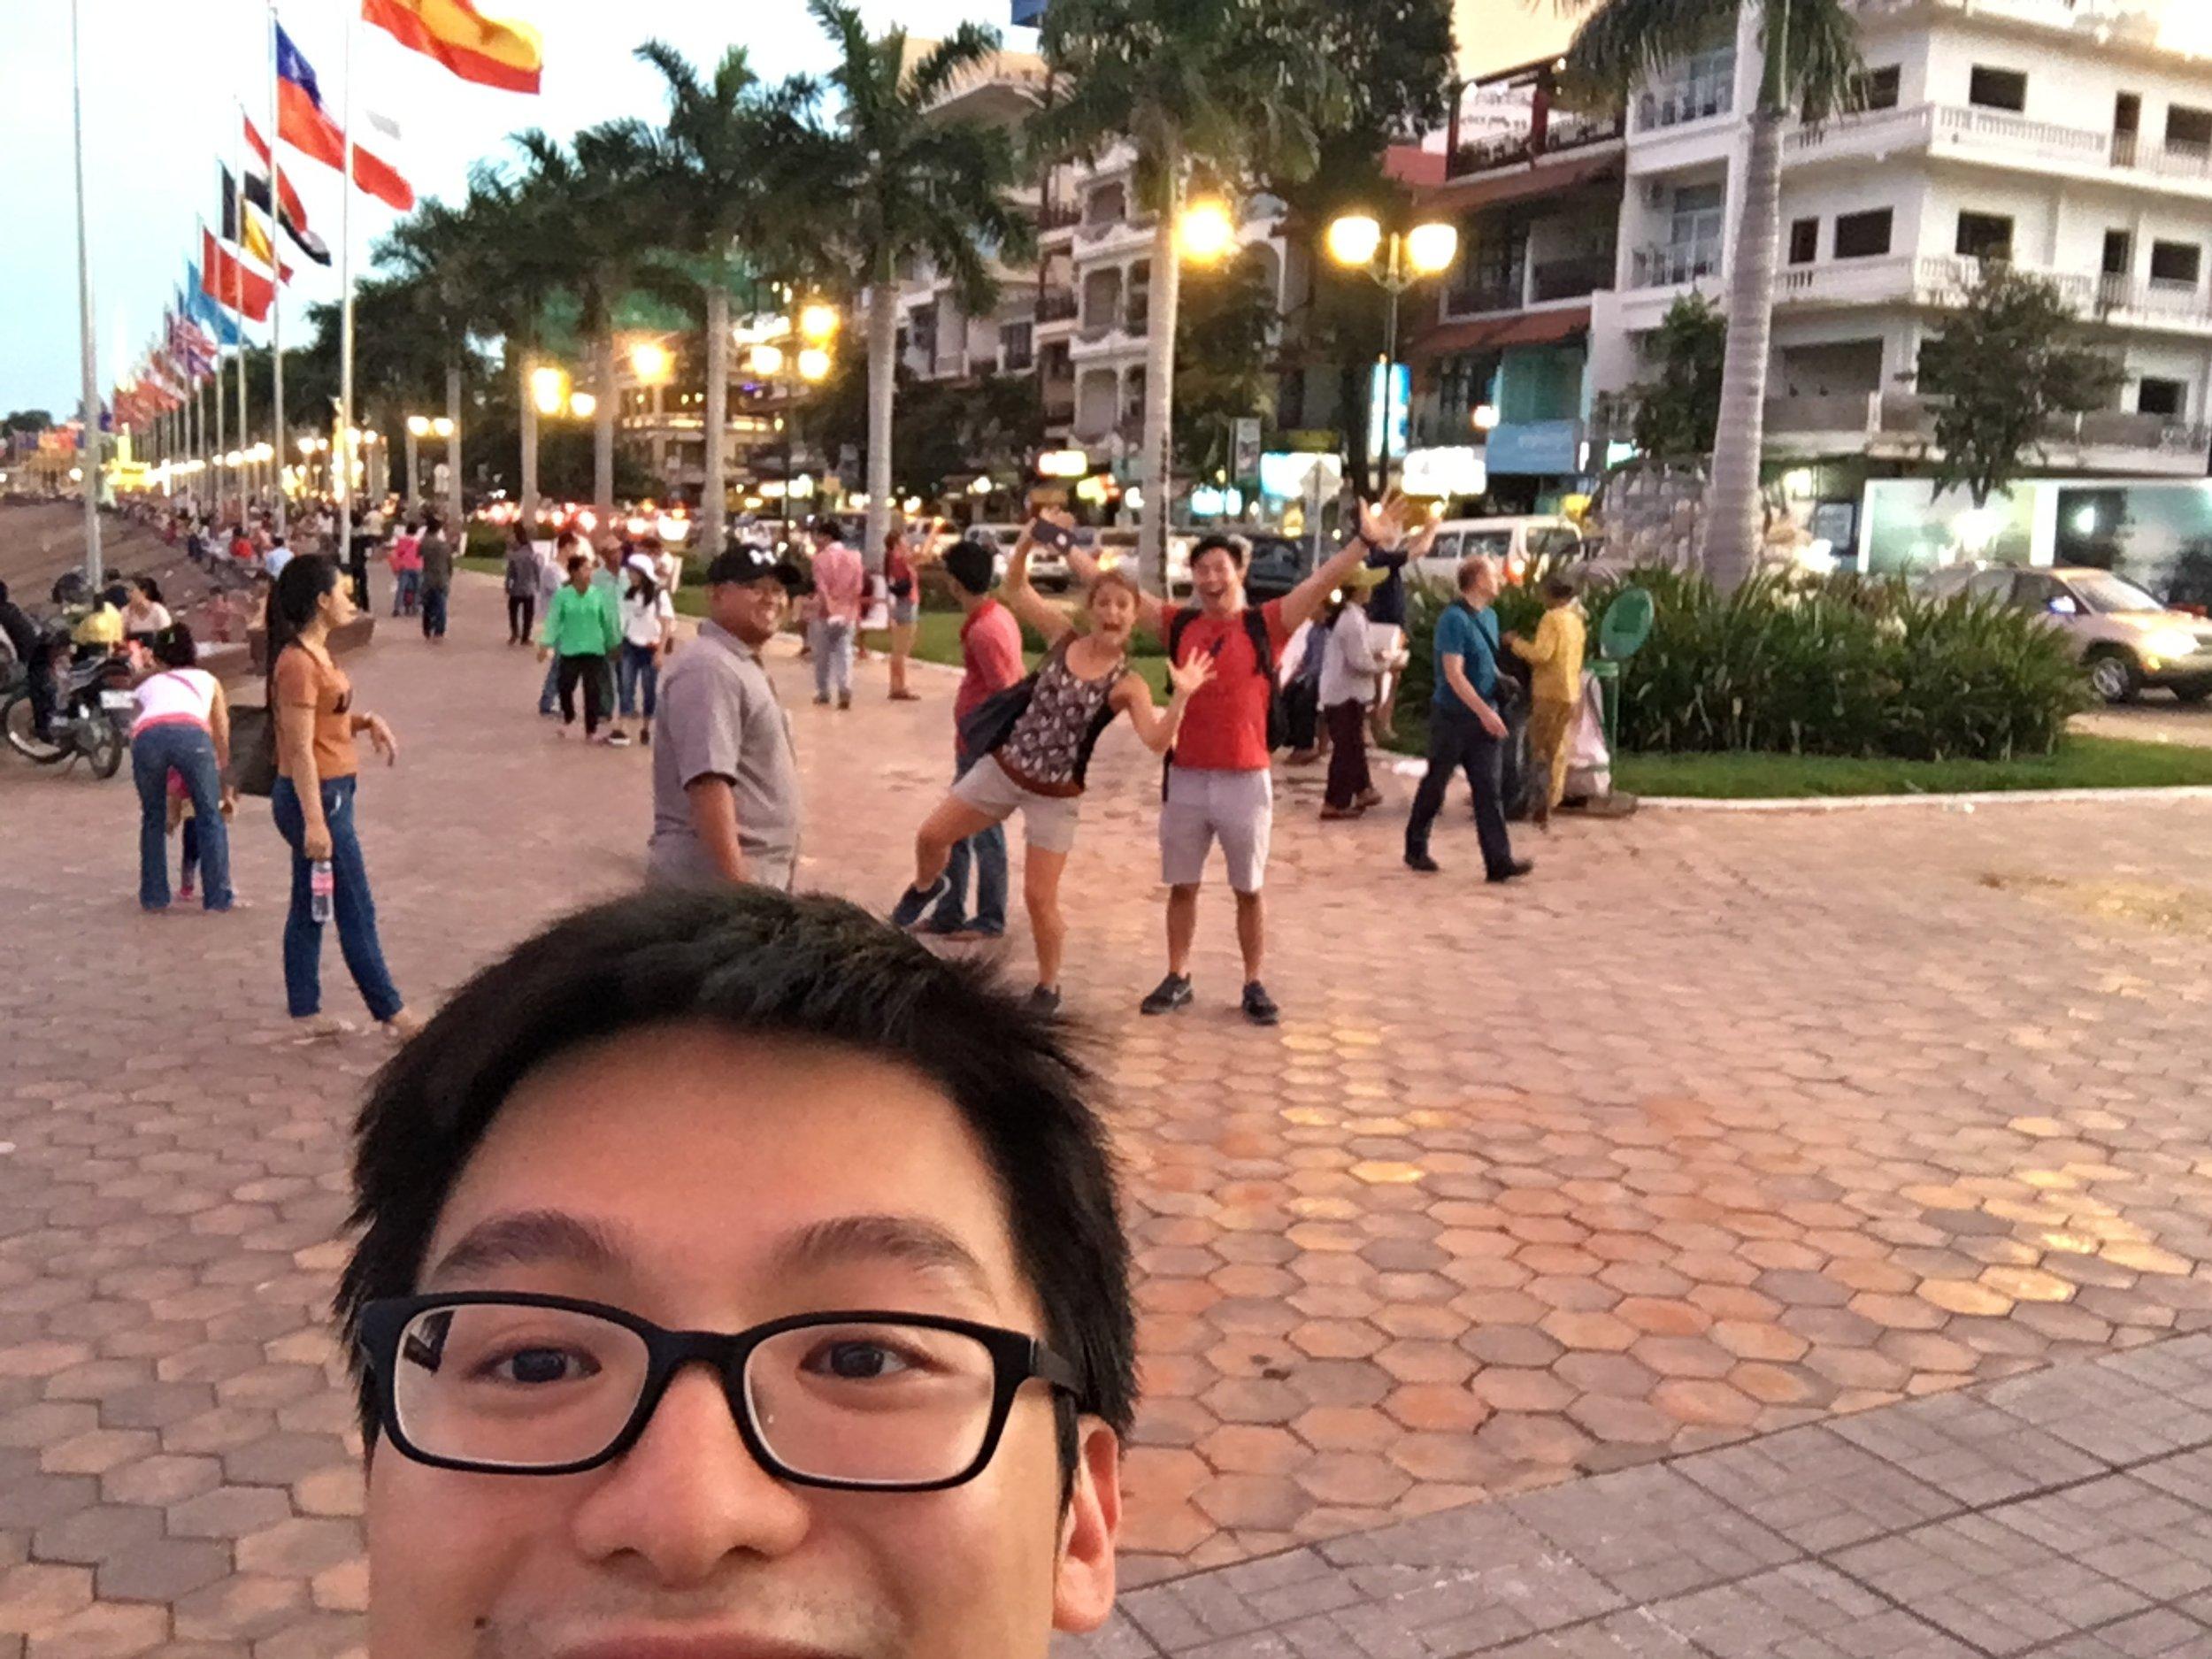 Having fun at Mumuot Ton Le. It's near the royal palace.